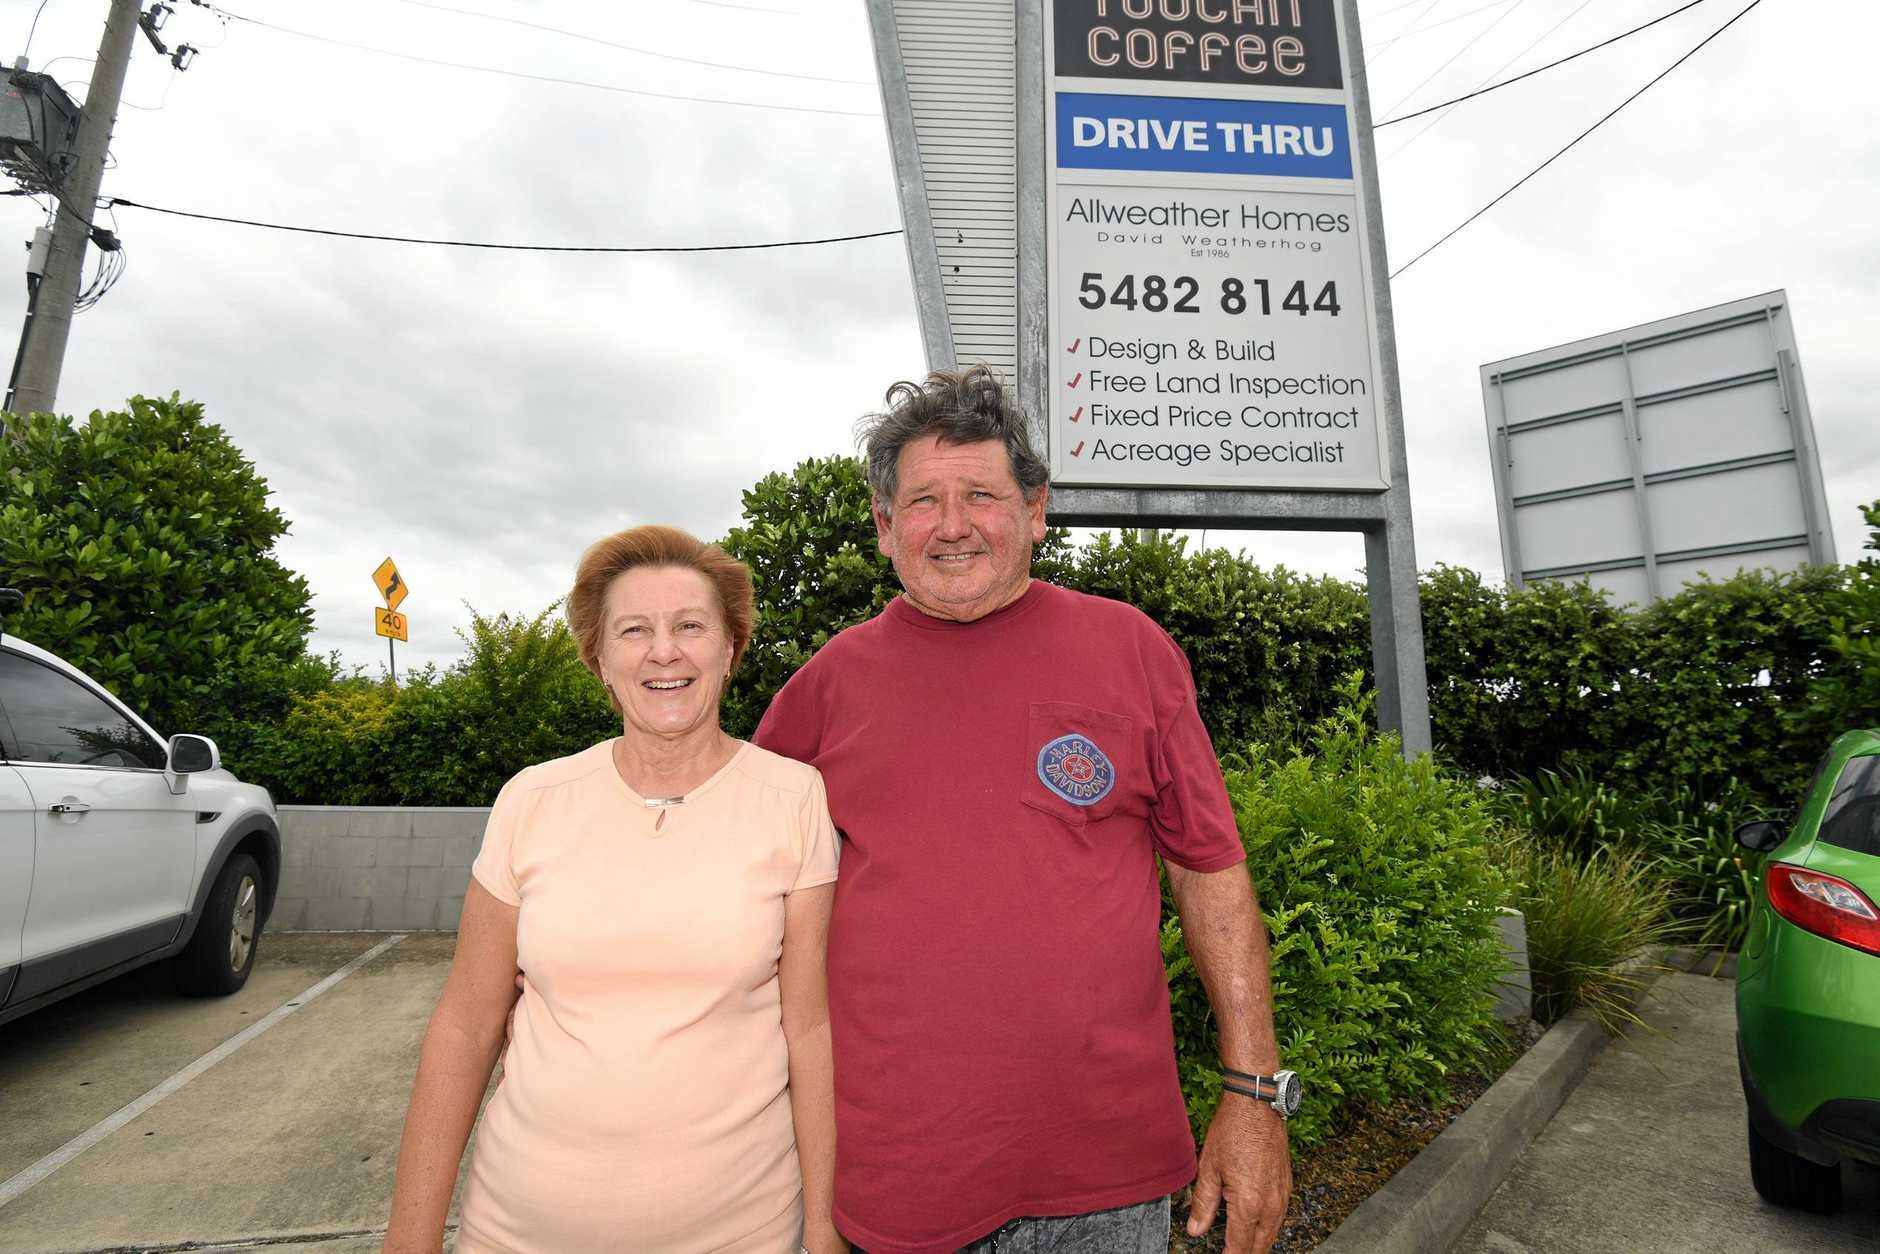 David and Debbie Weatherhog